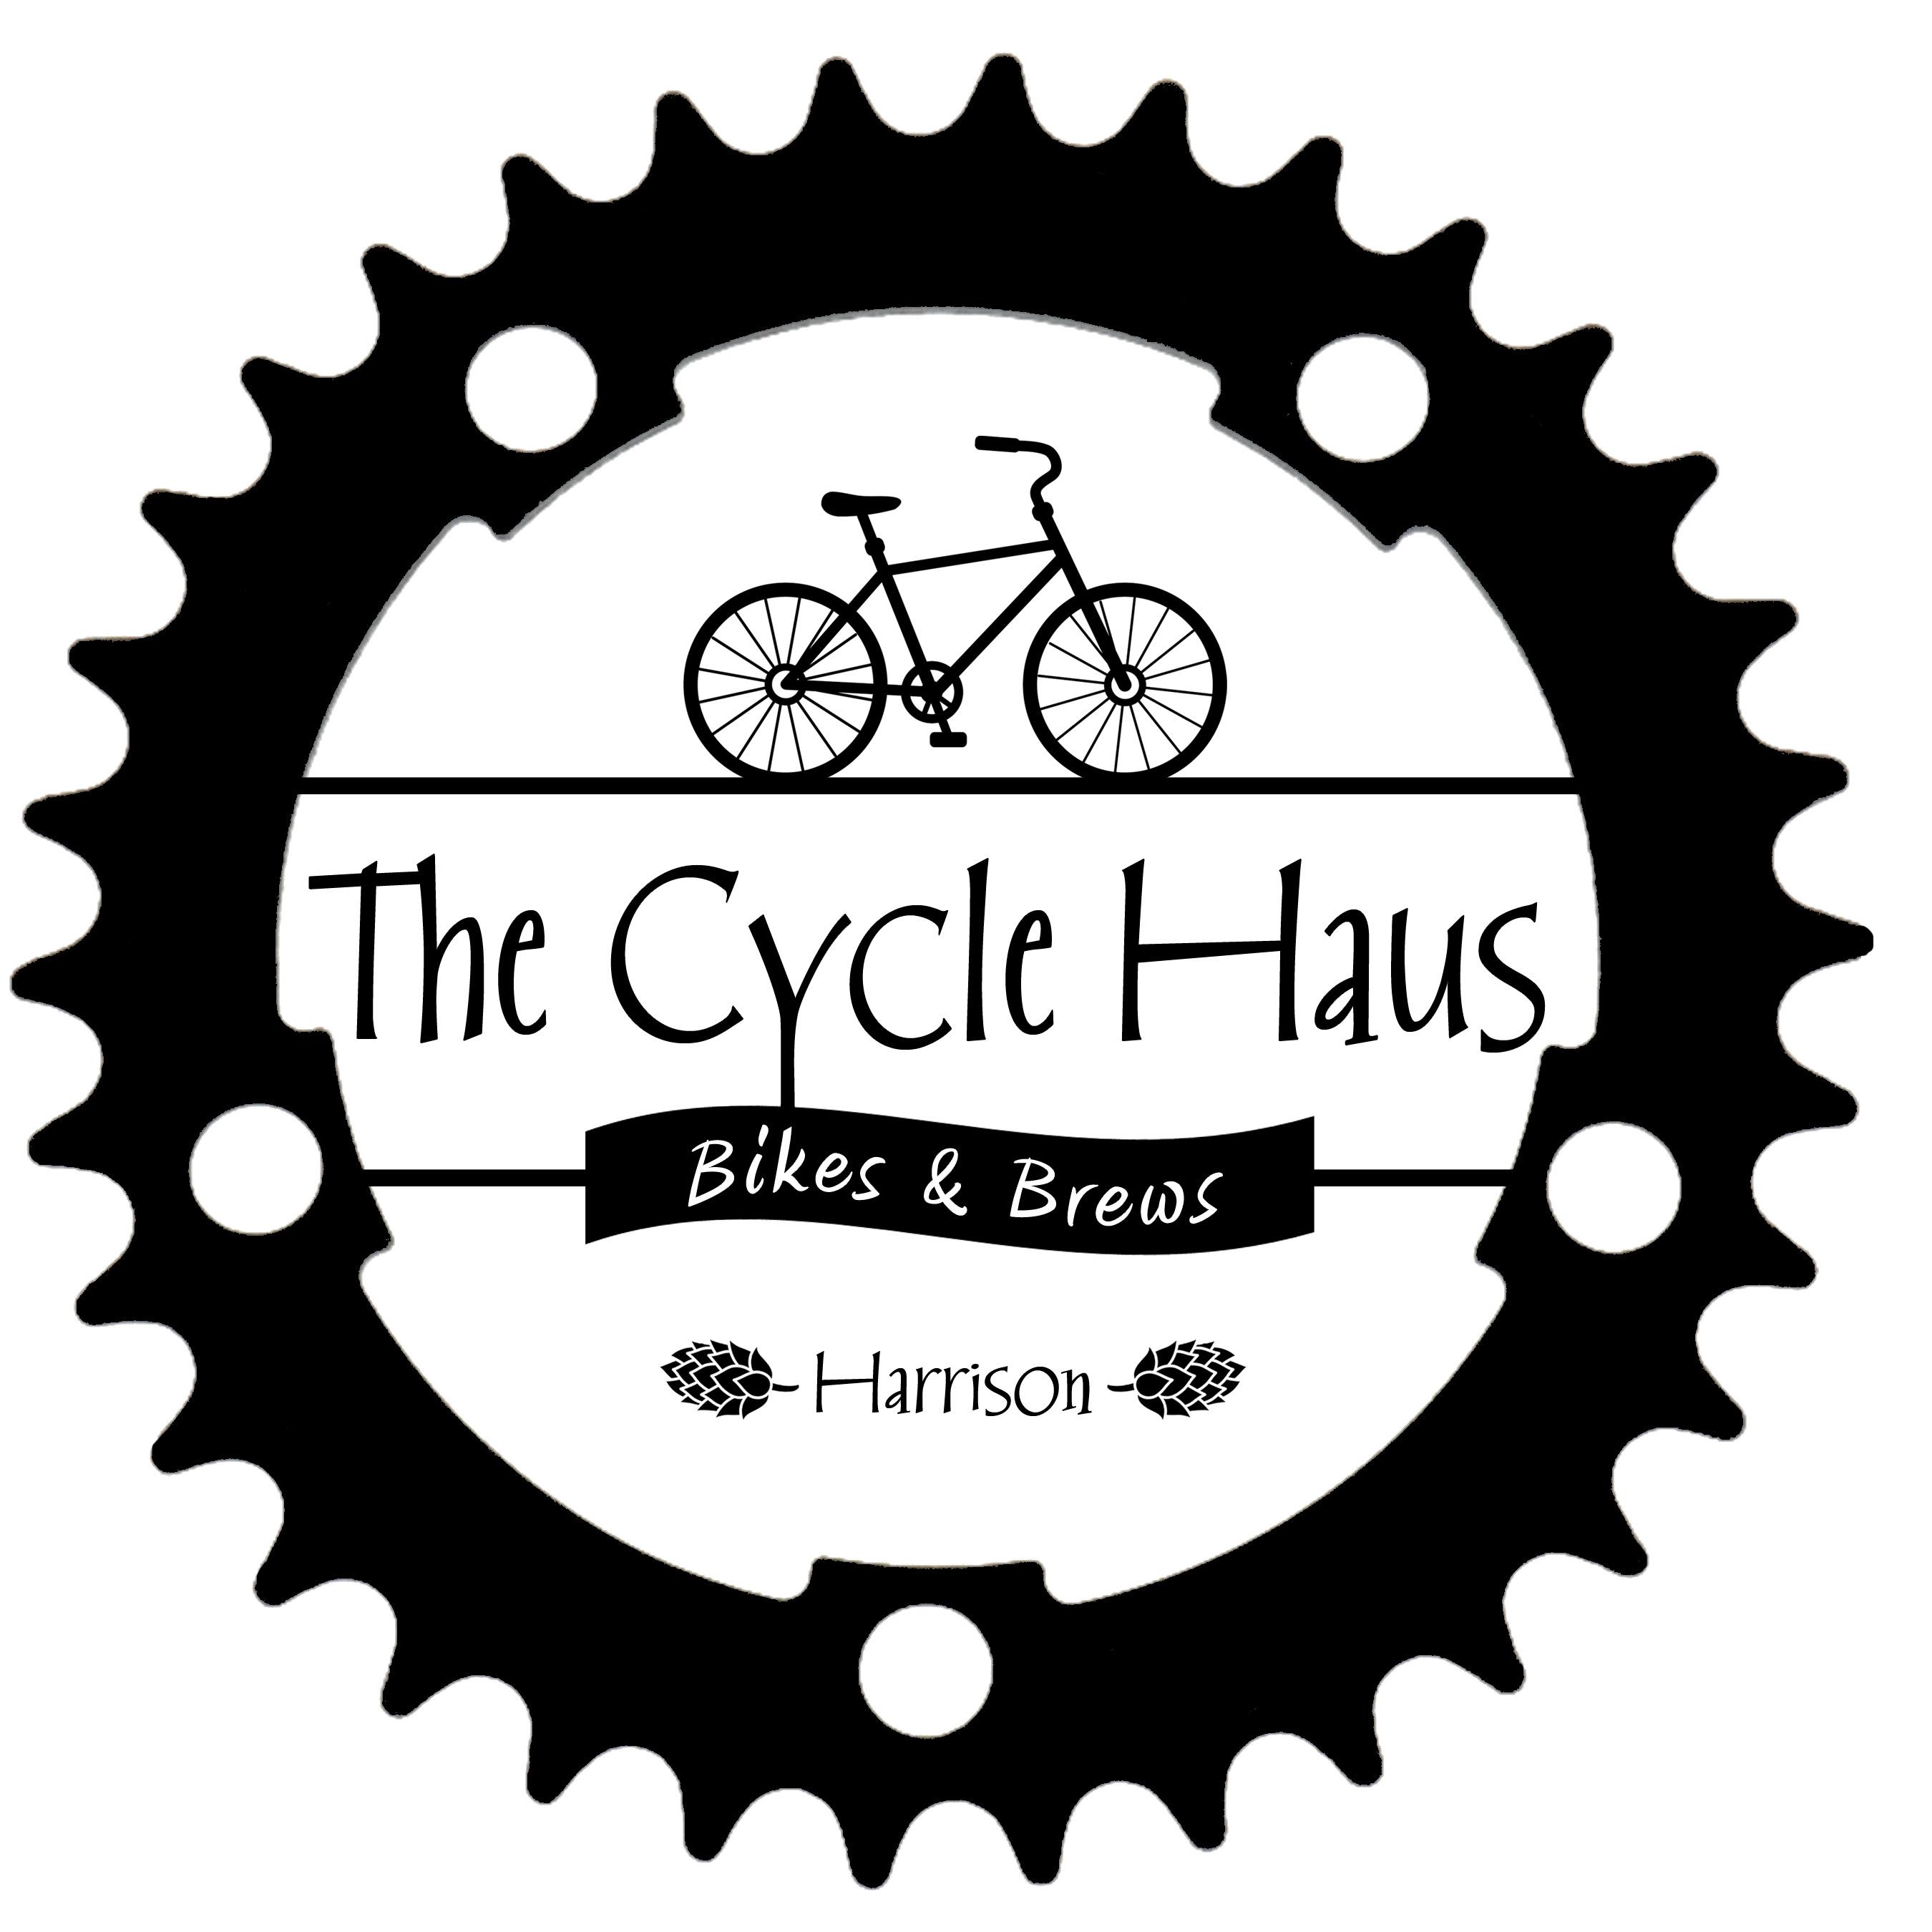 Harrison Bicycle rental